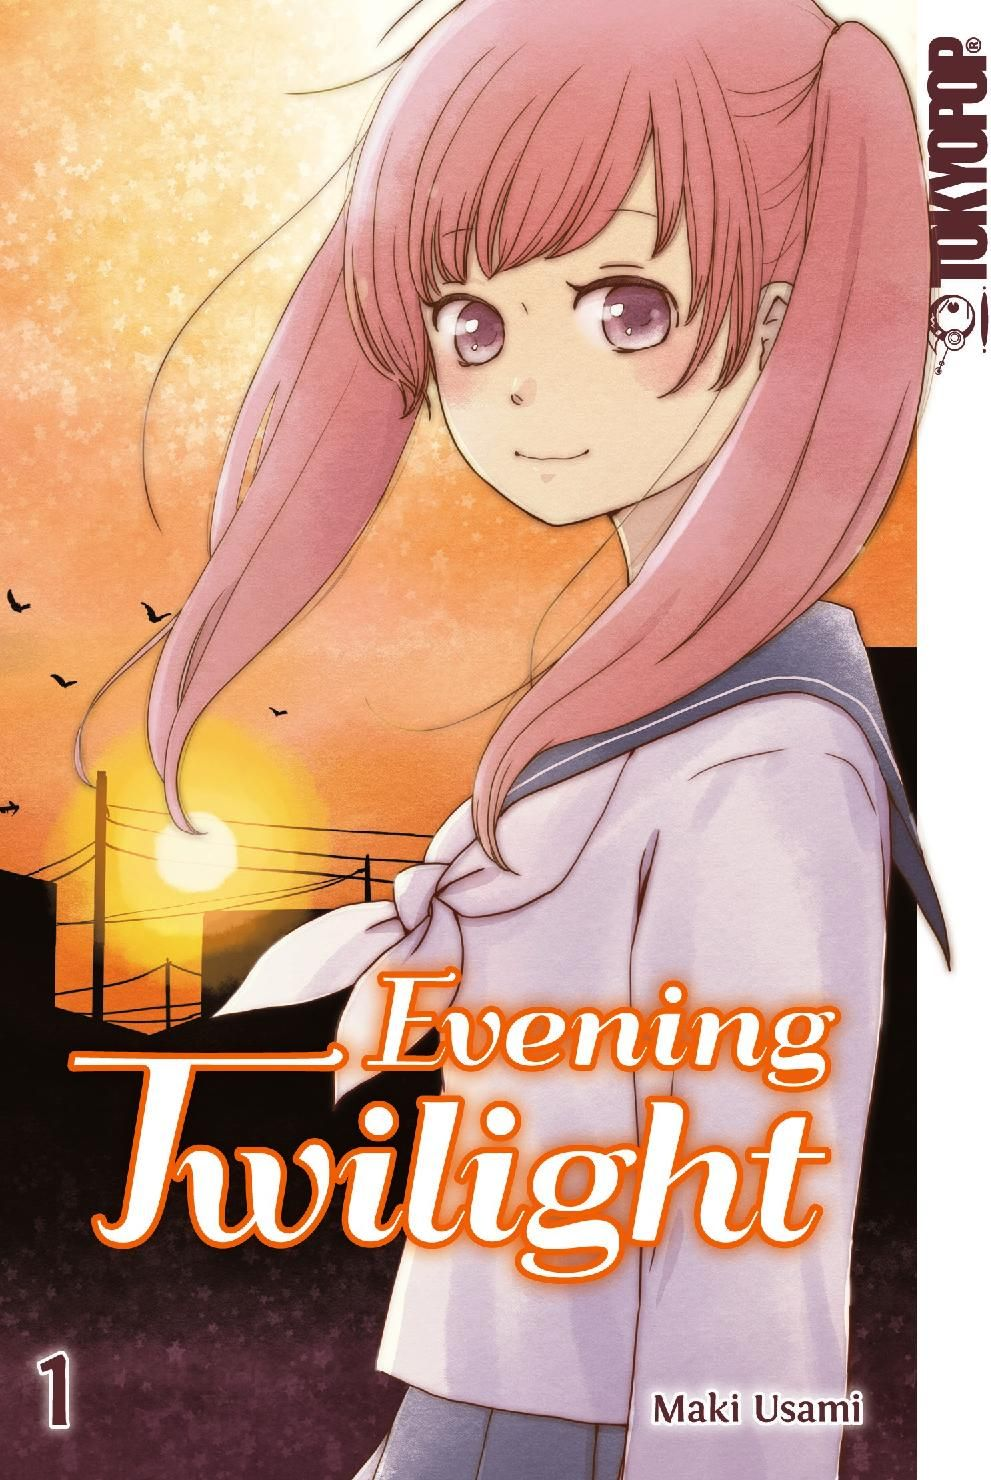 anime manga haven.html